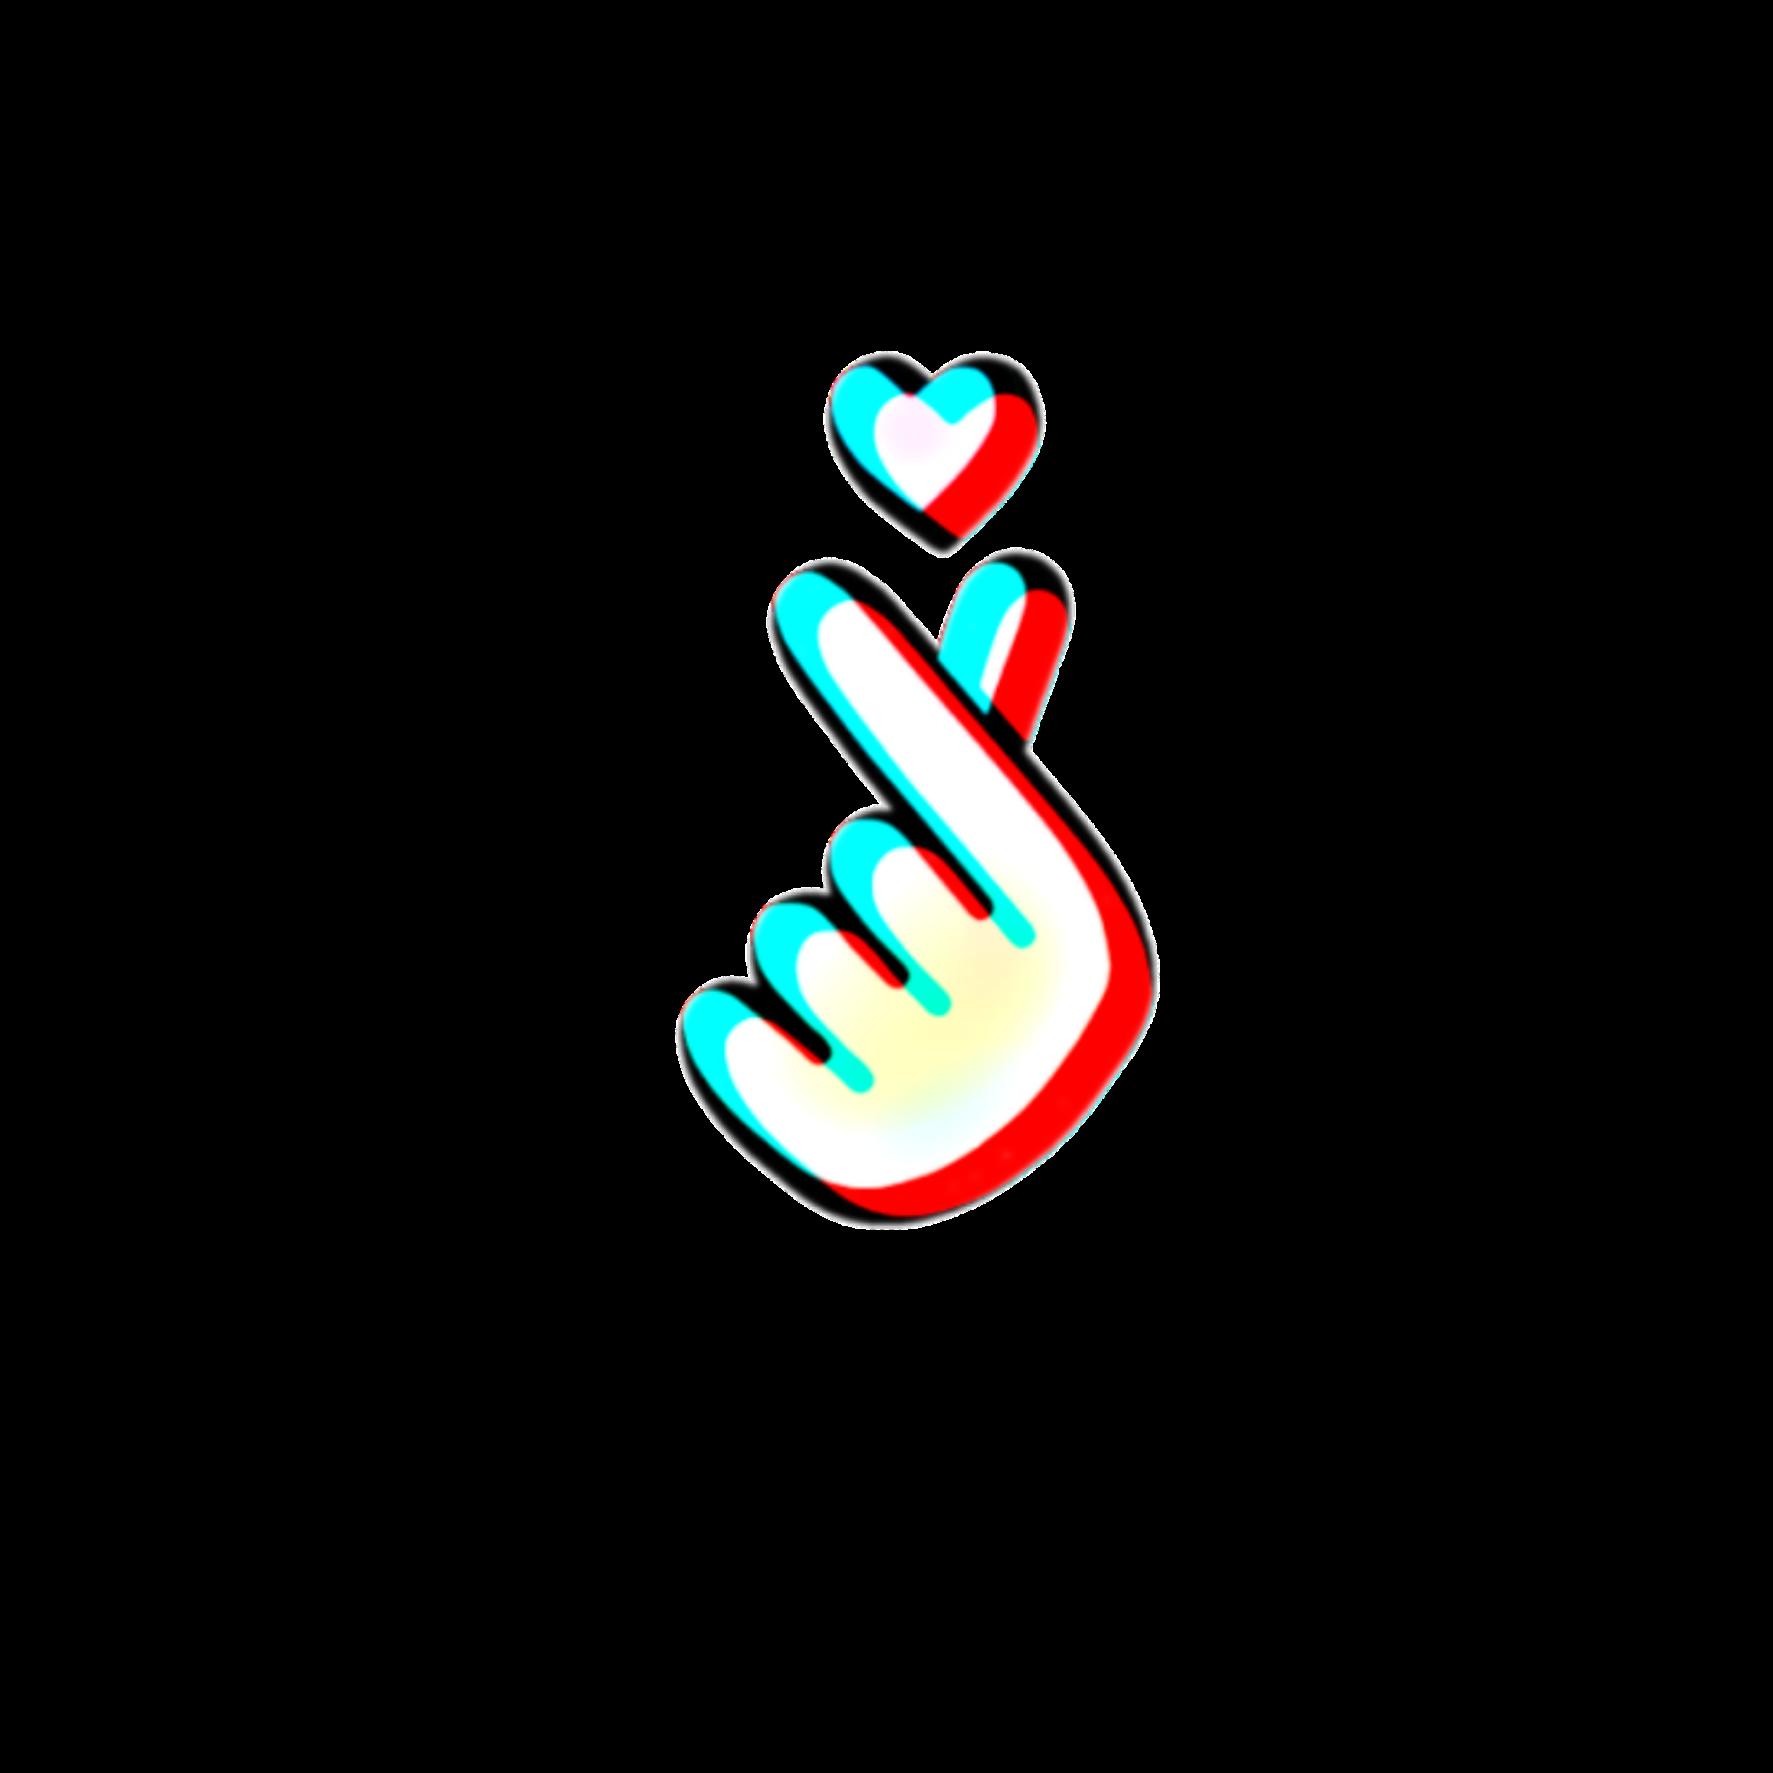 army corazon bts kpop superjunior exo vlive heart love